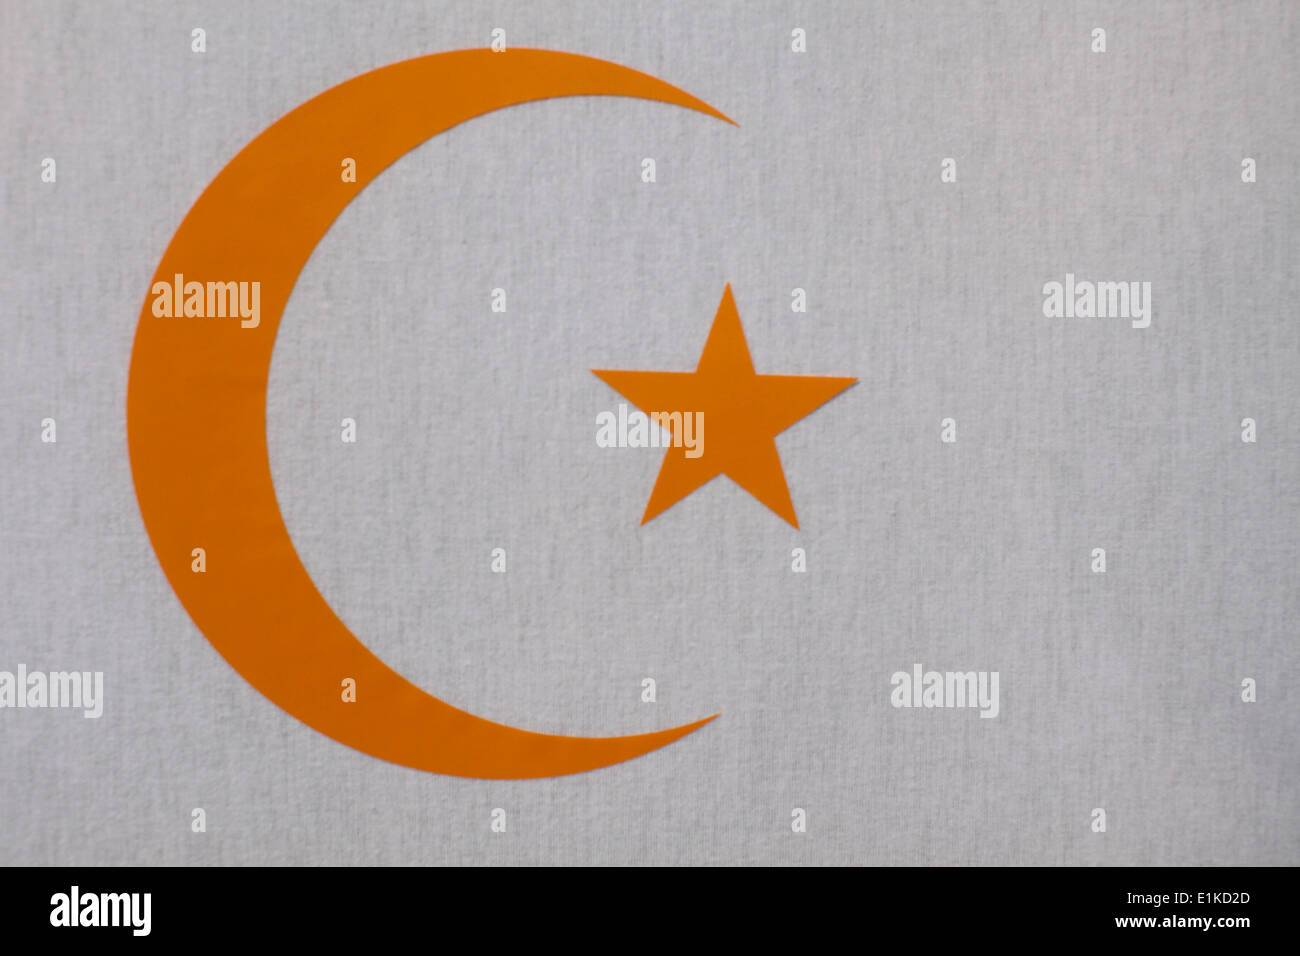 Symbols Of Islam Stock Photos Symbols Of Islam Stock Images Alamy